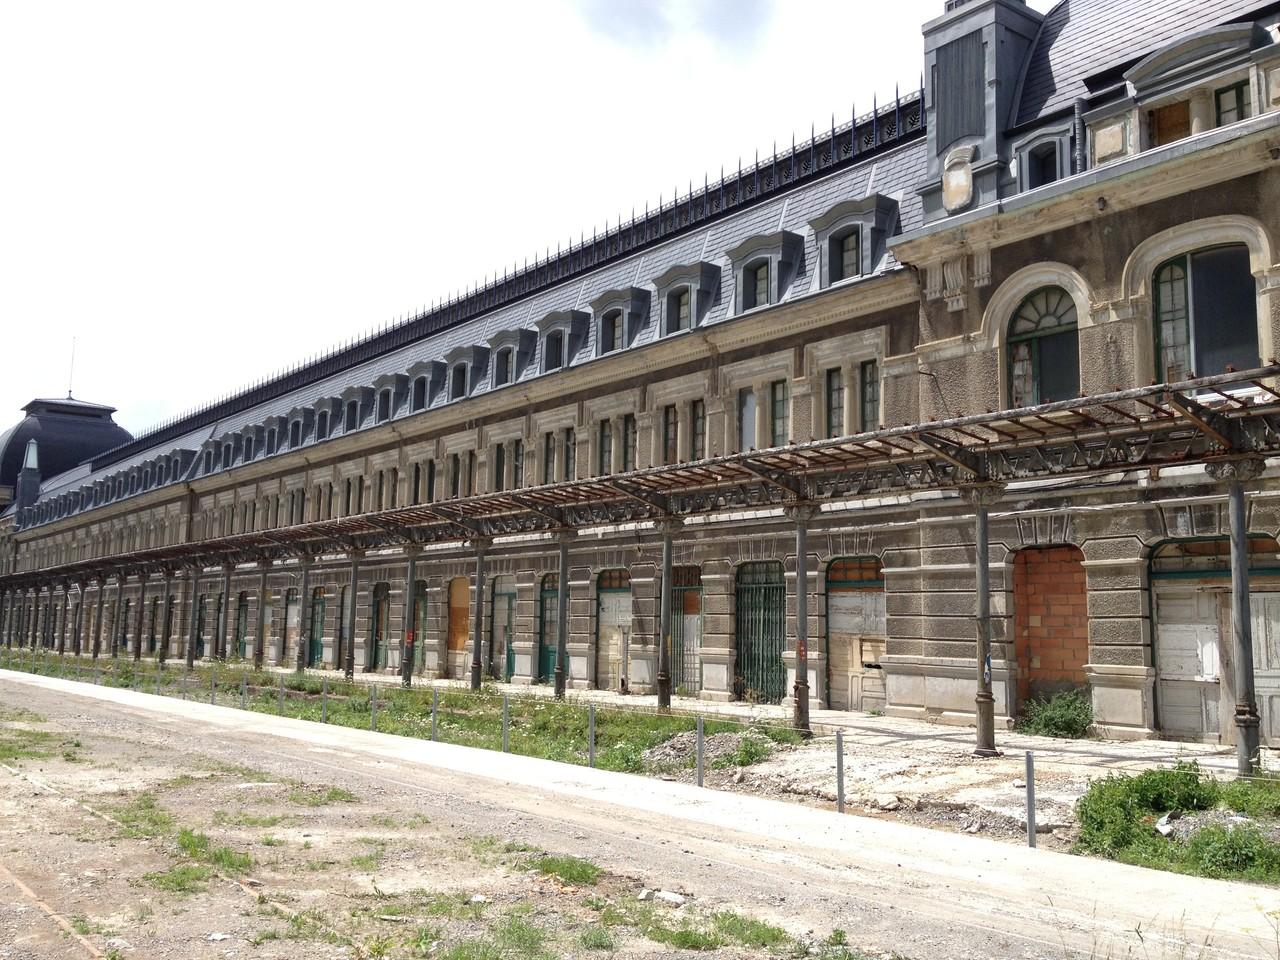 Bahnhof Canfranc Estacion